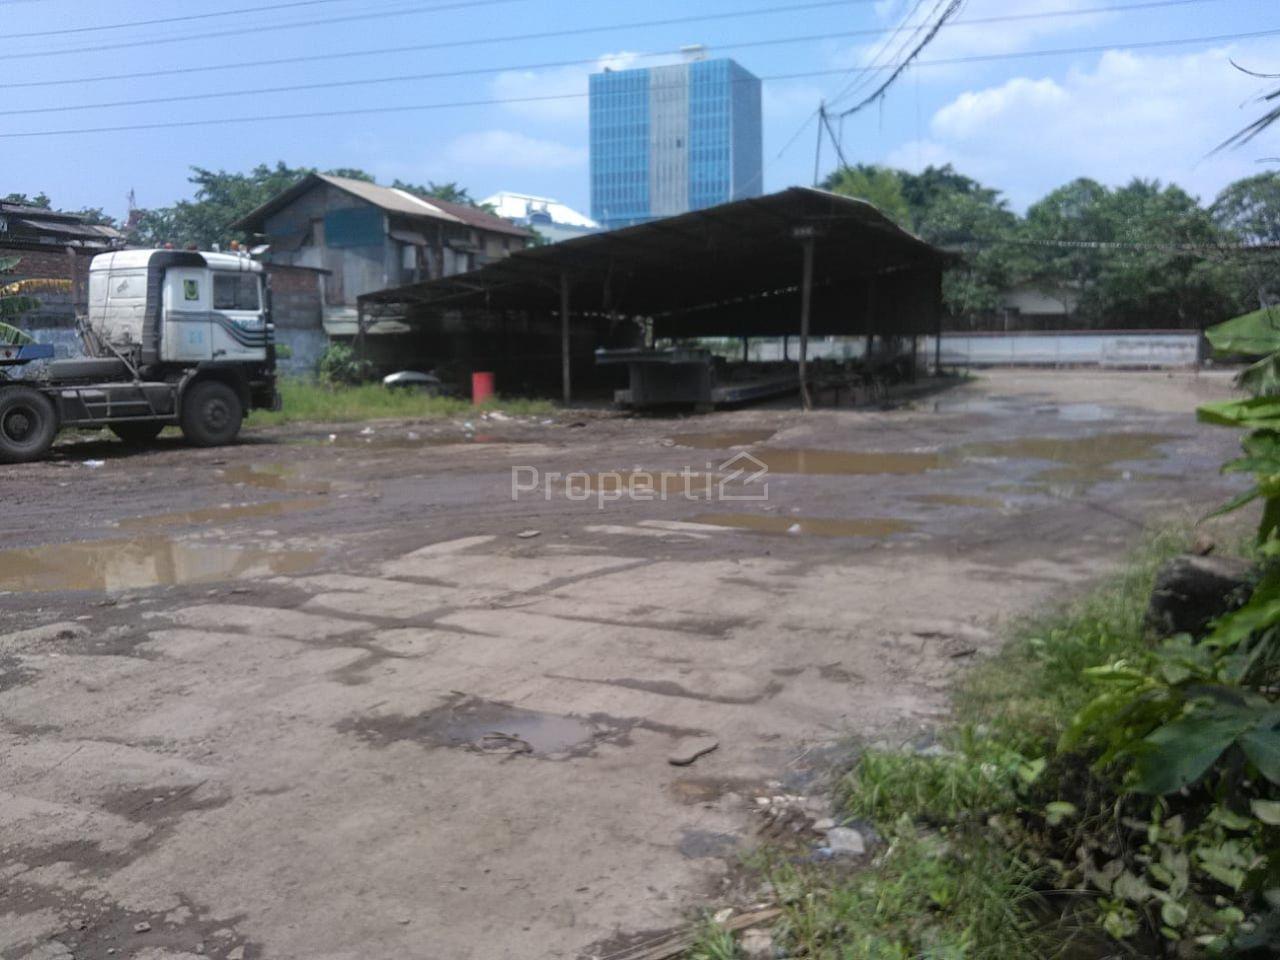 Lahan Strategis 1,7 Ha di Kelapa Gading, Jakarta Utara, DKI Jakarta